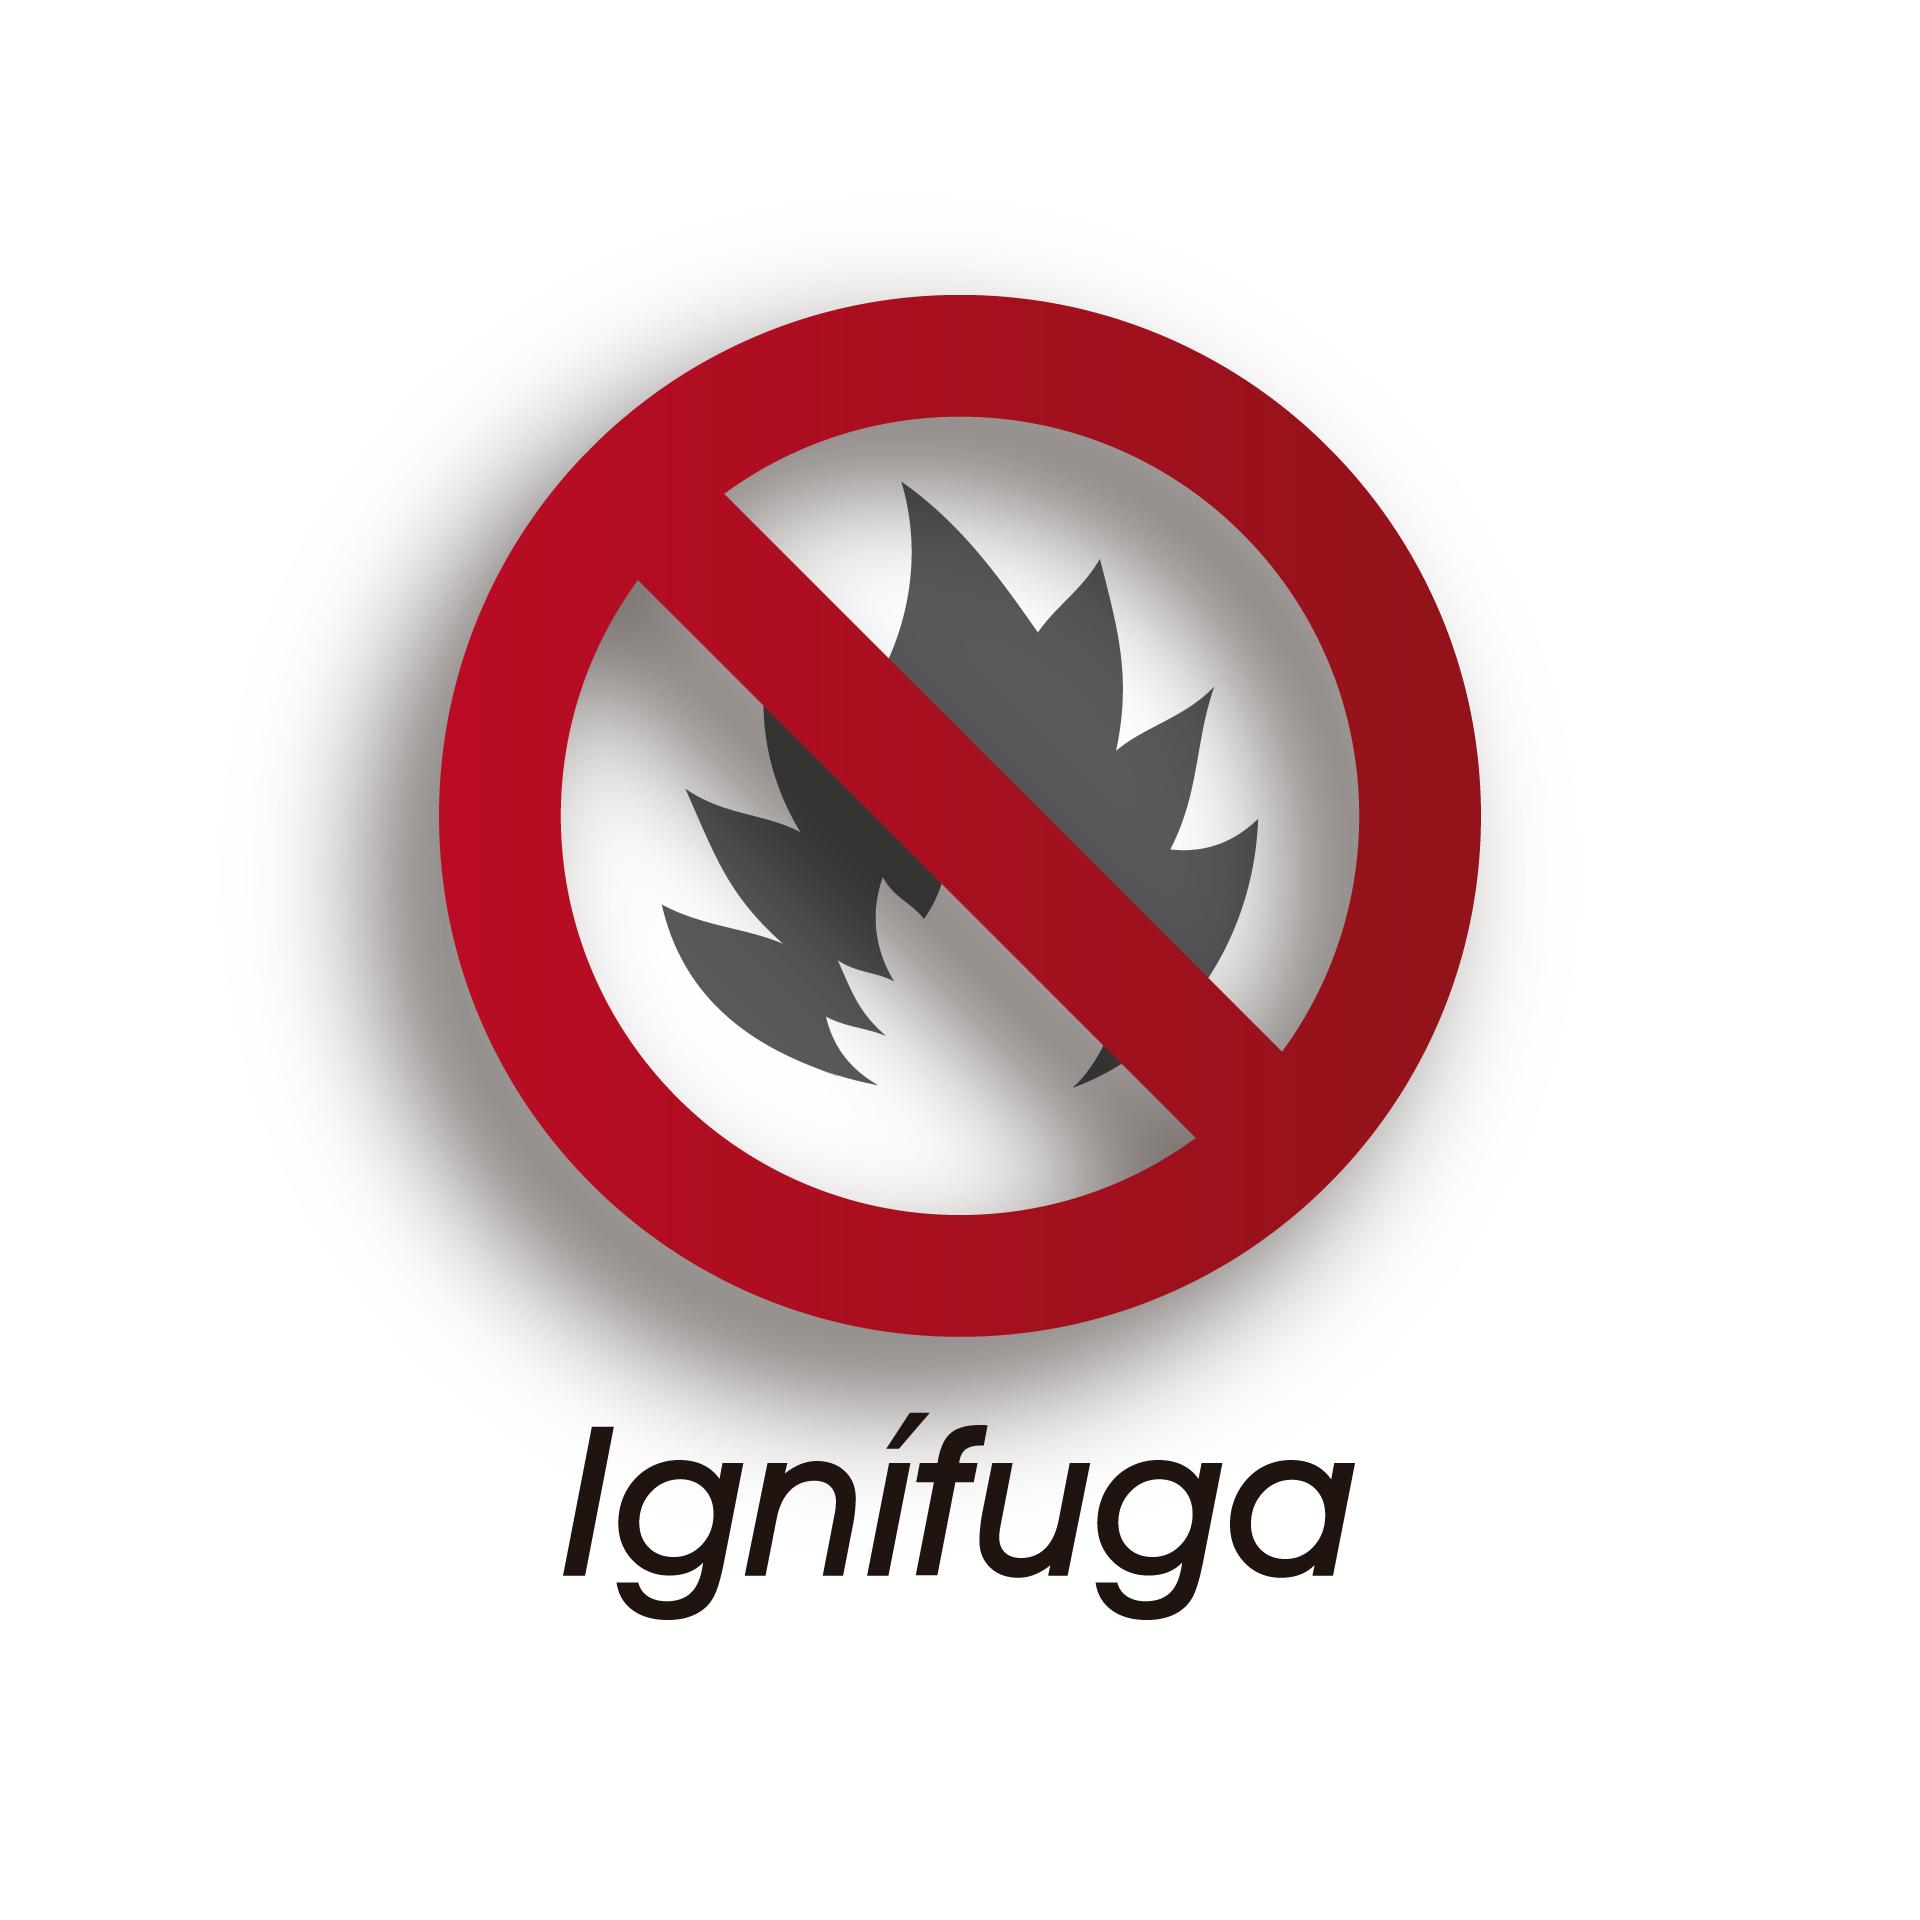 IGNIFUGA